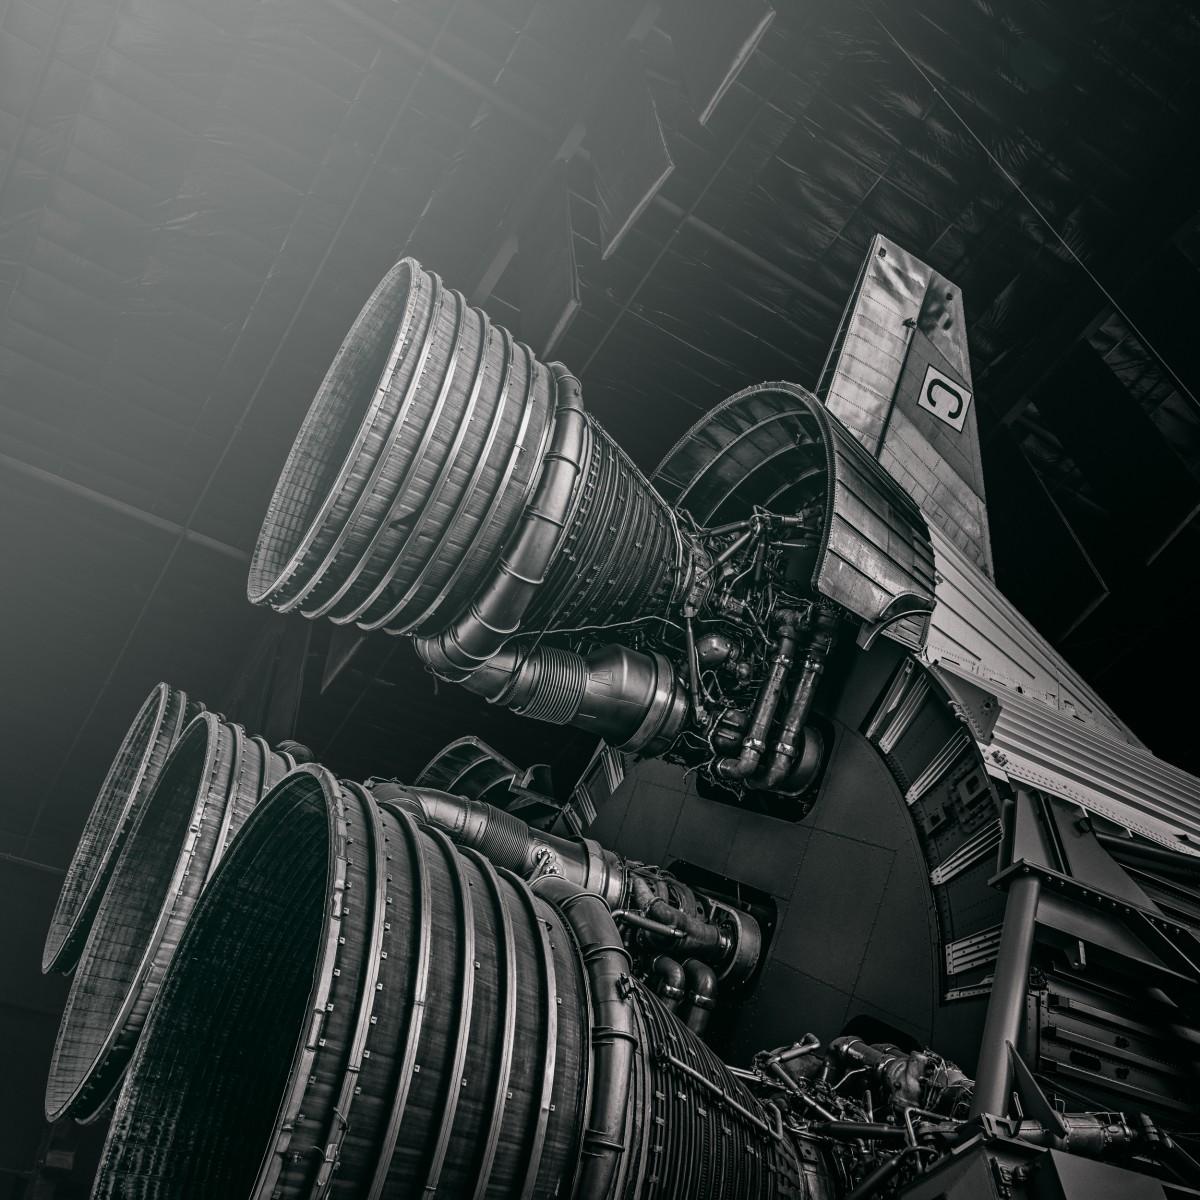 Saturn V #2 by Morgan Silk